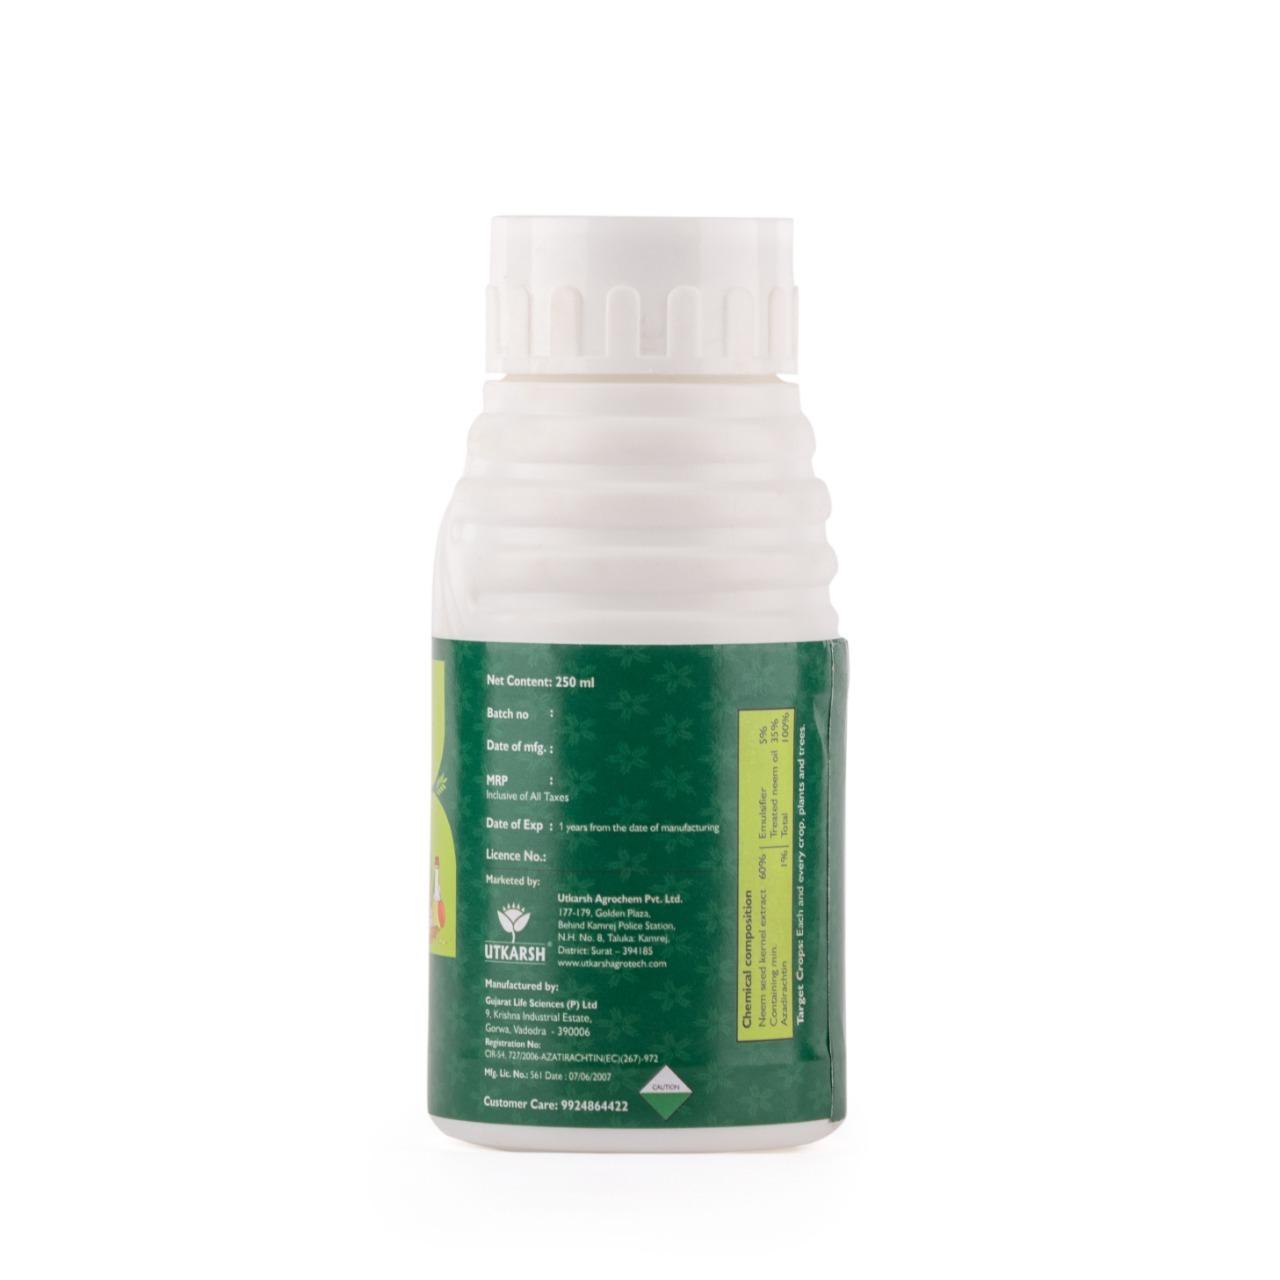 Neem Oil - Azadirachtin E.C. 1% w/w, 10000 ppm